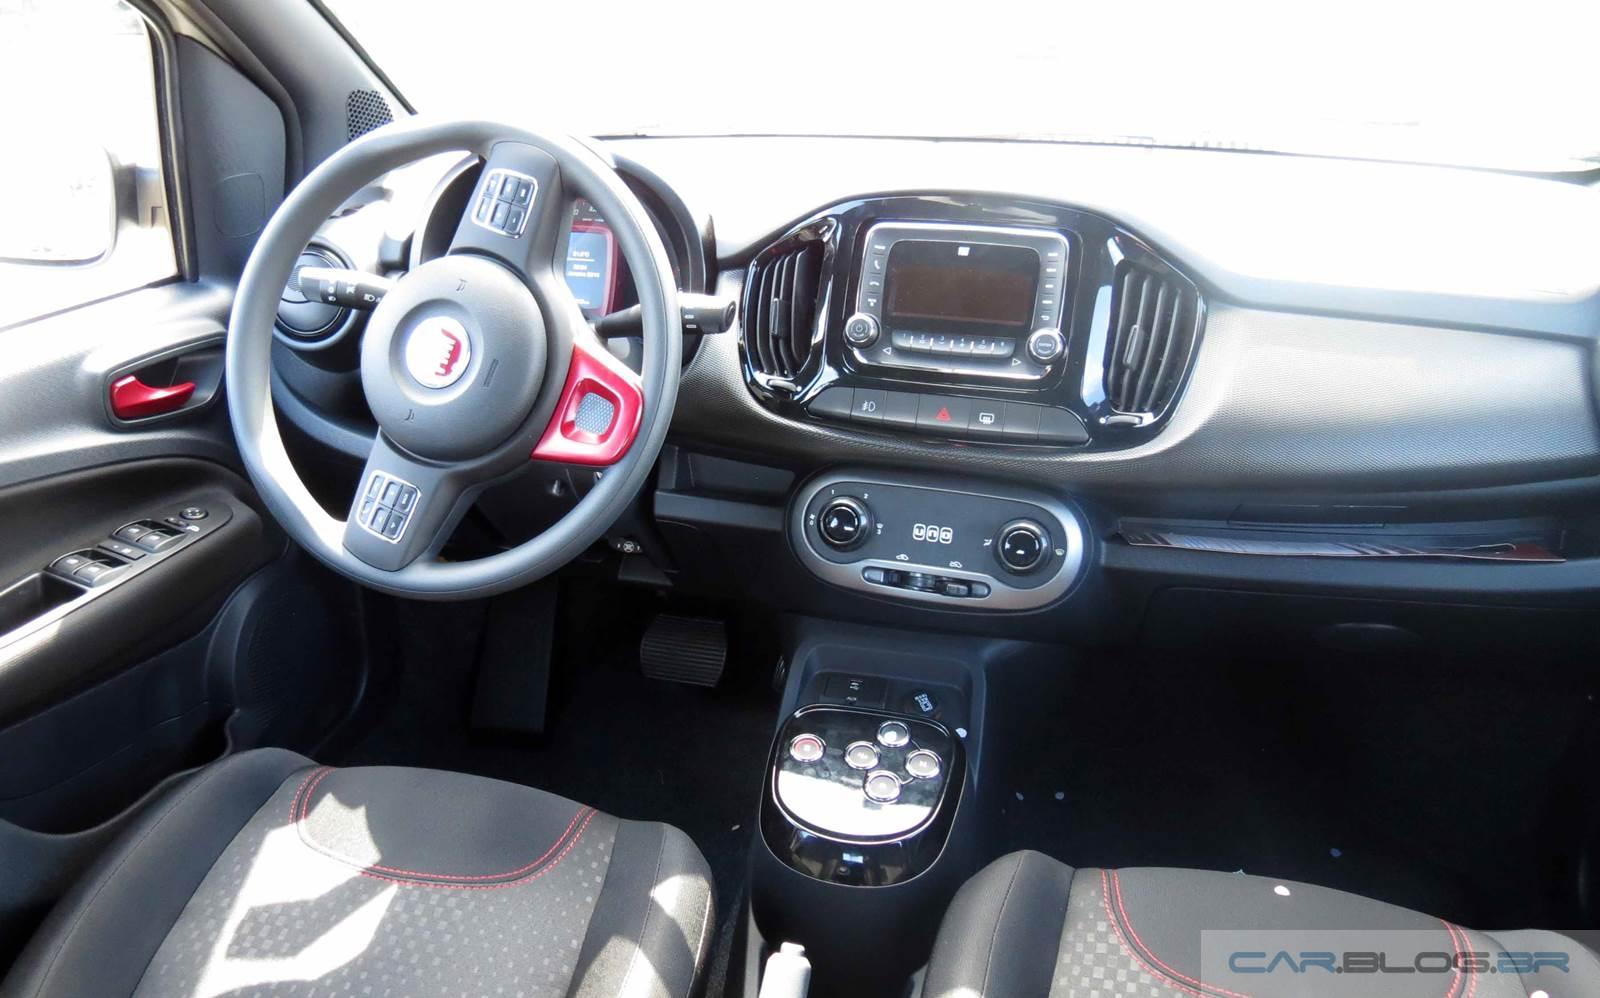 Novo Fiat Uno 1.4 Sporting 2015 - preço - interior